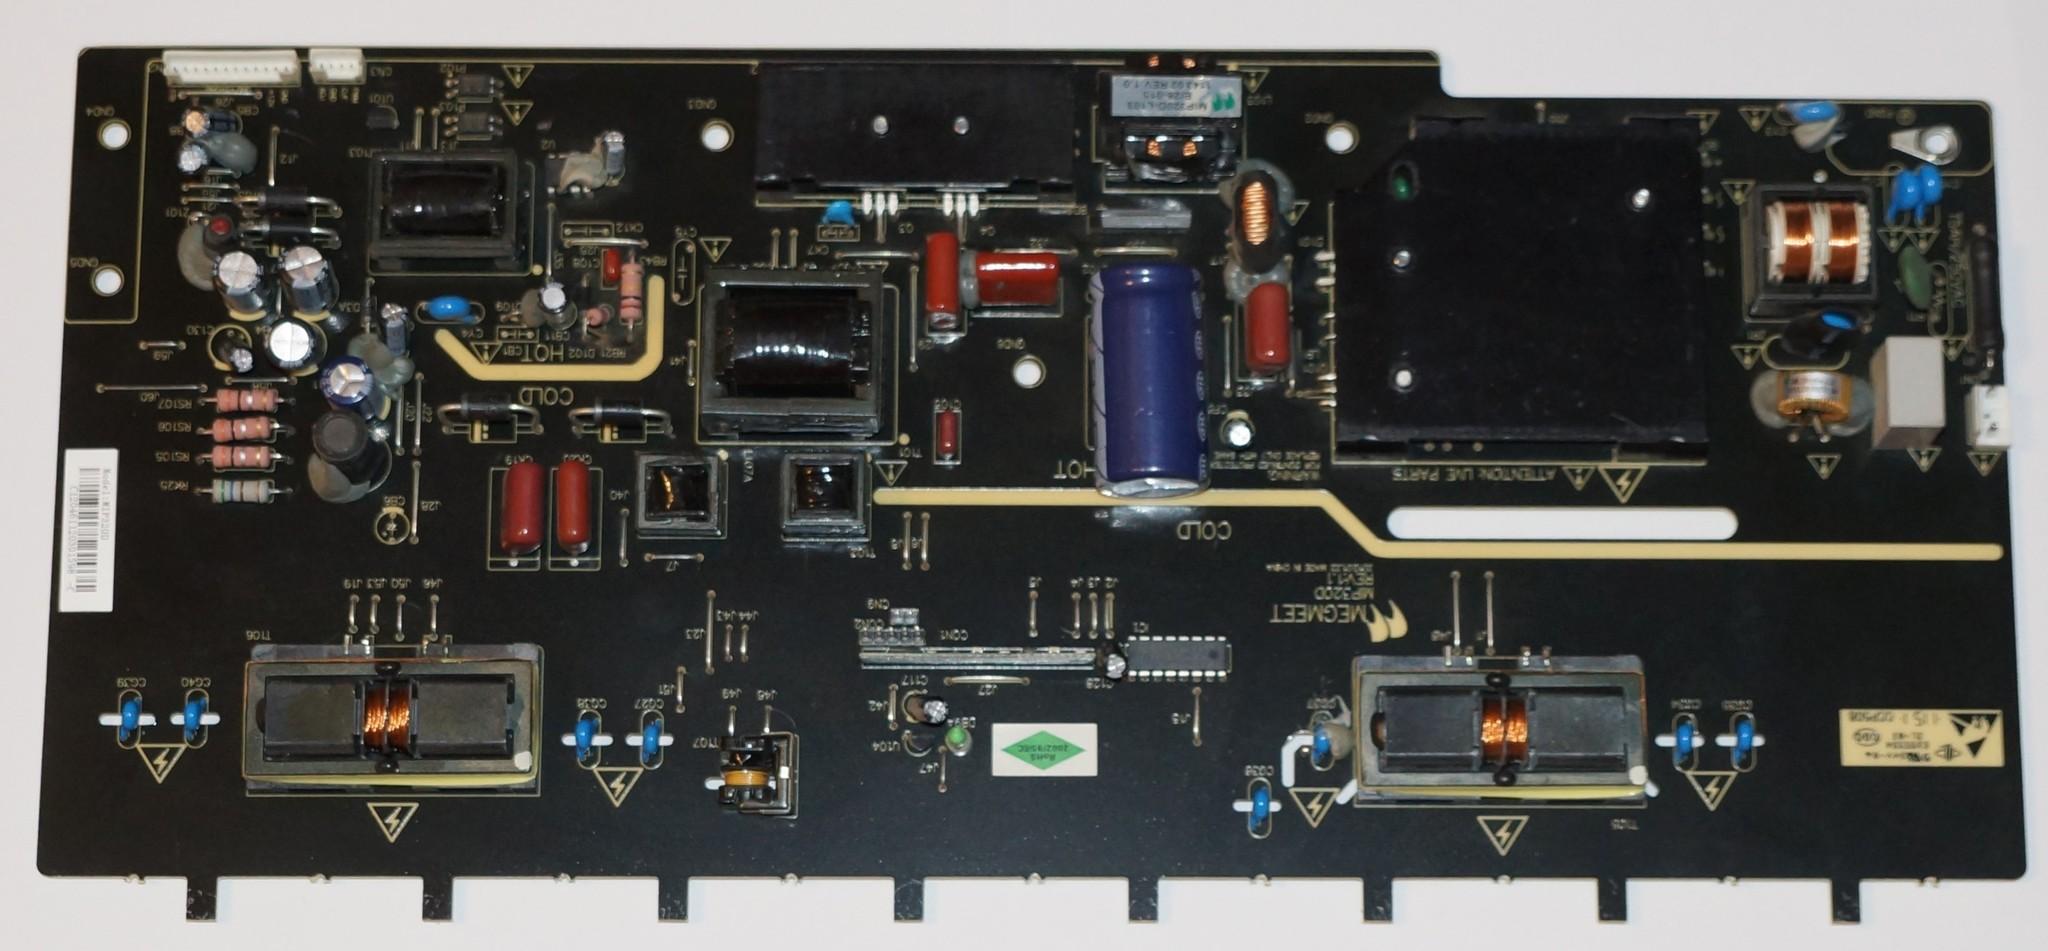 MIP320D блок питания с инвертором телевизора Supra, Changhong